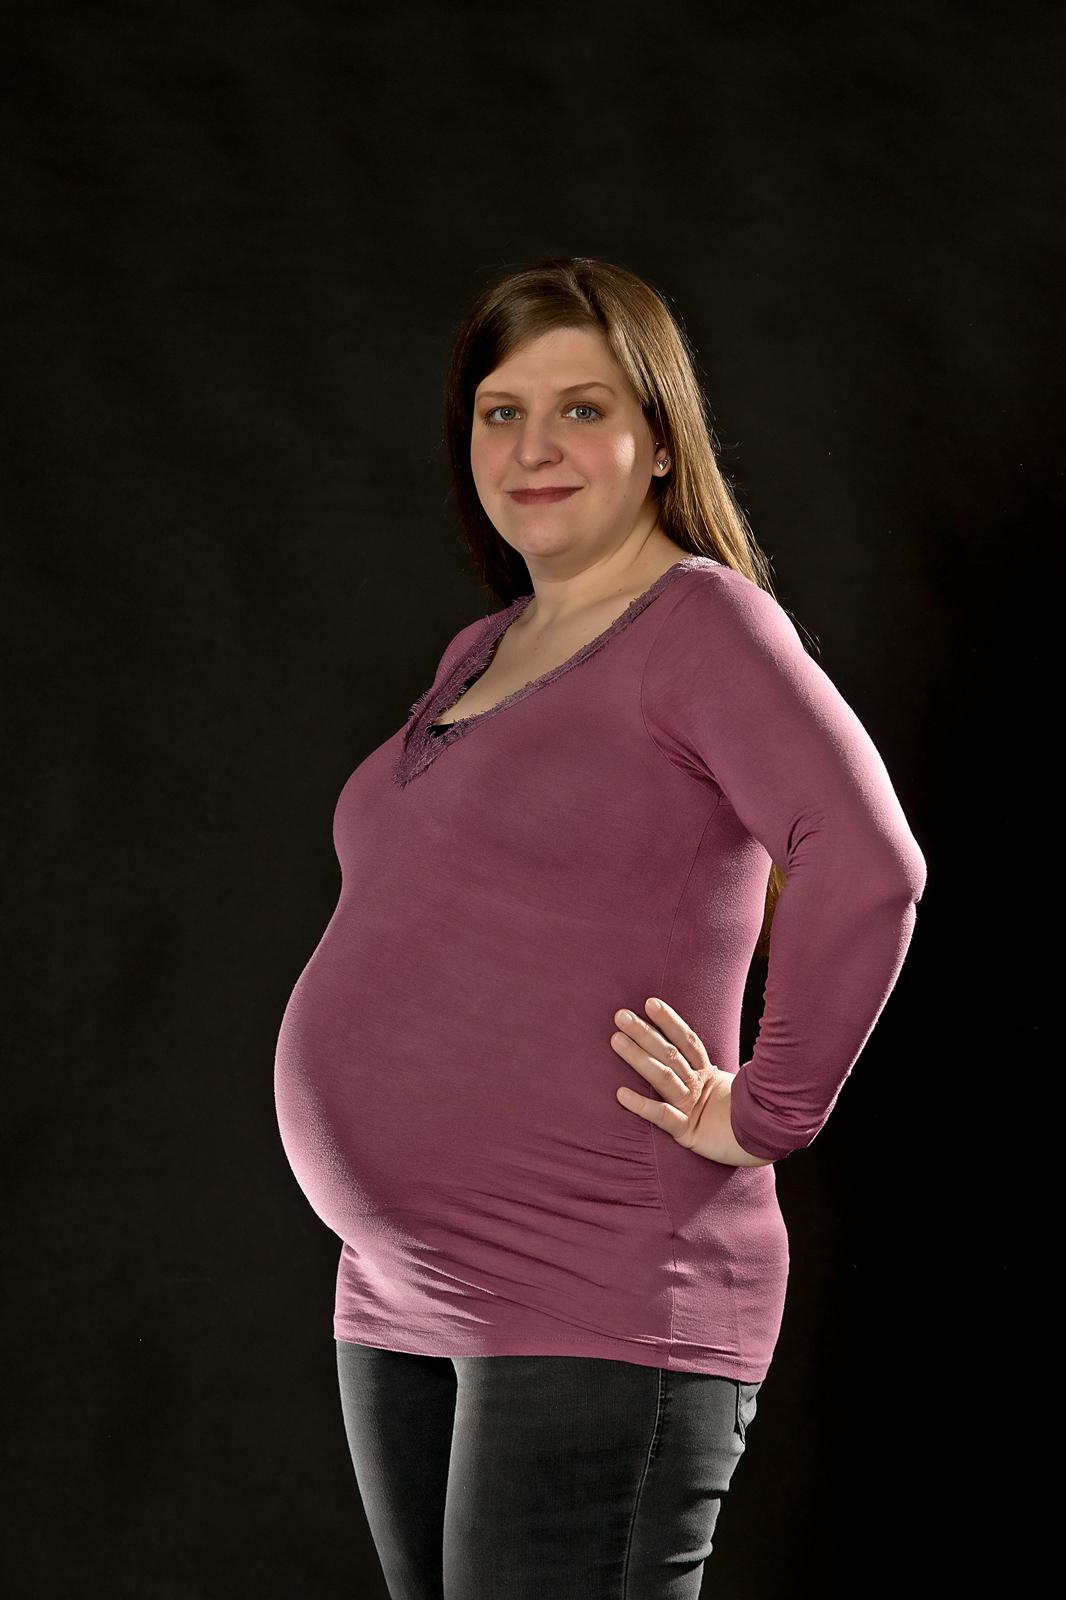 Babybauchshooting-im-Profil